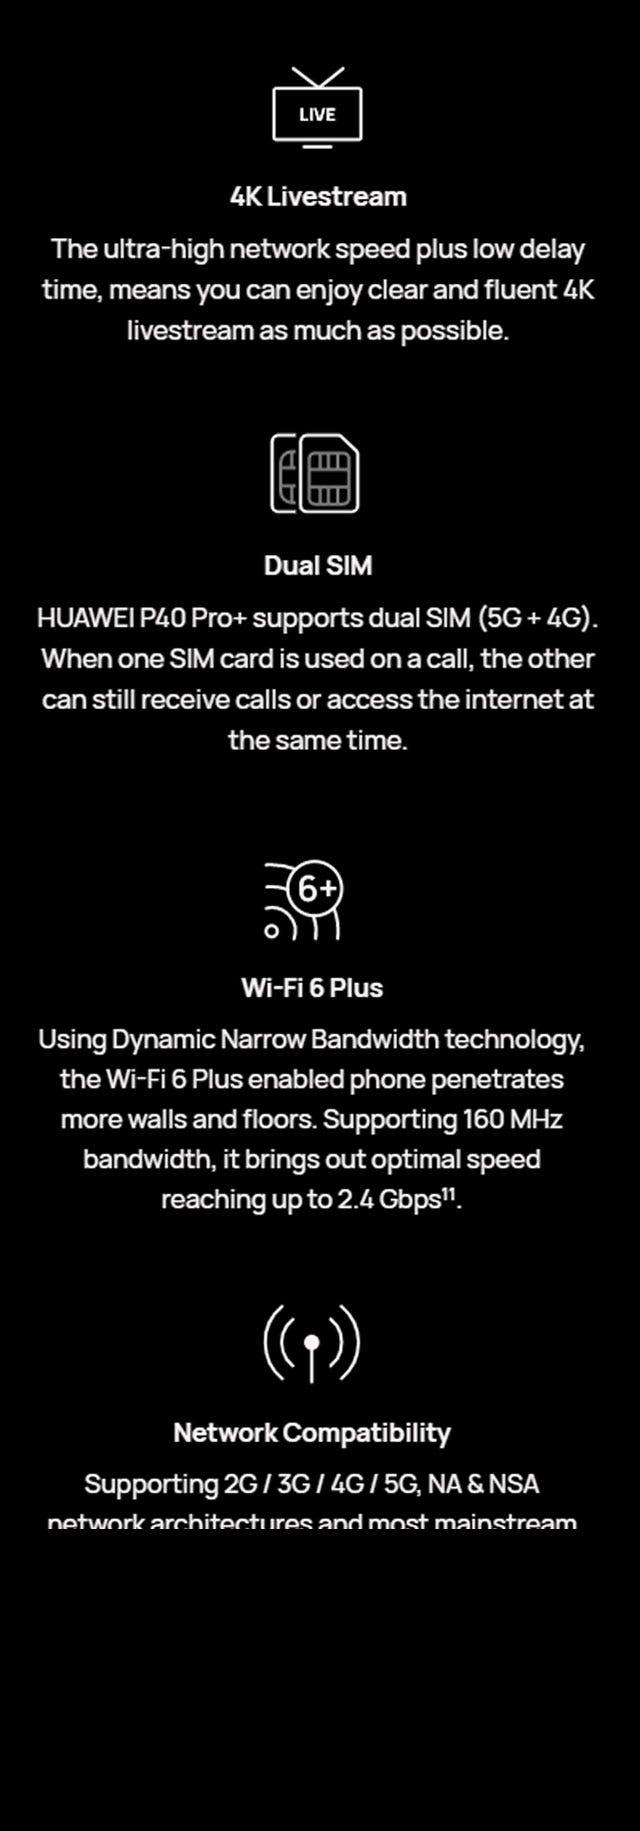 4K Livestream, Dual SIM Plus eSIM, Wi-Fi 6 Plus, Network Compatibility